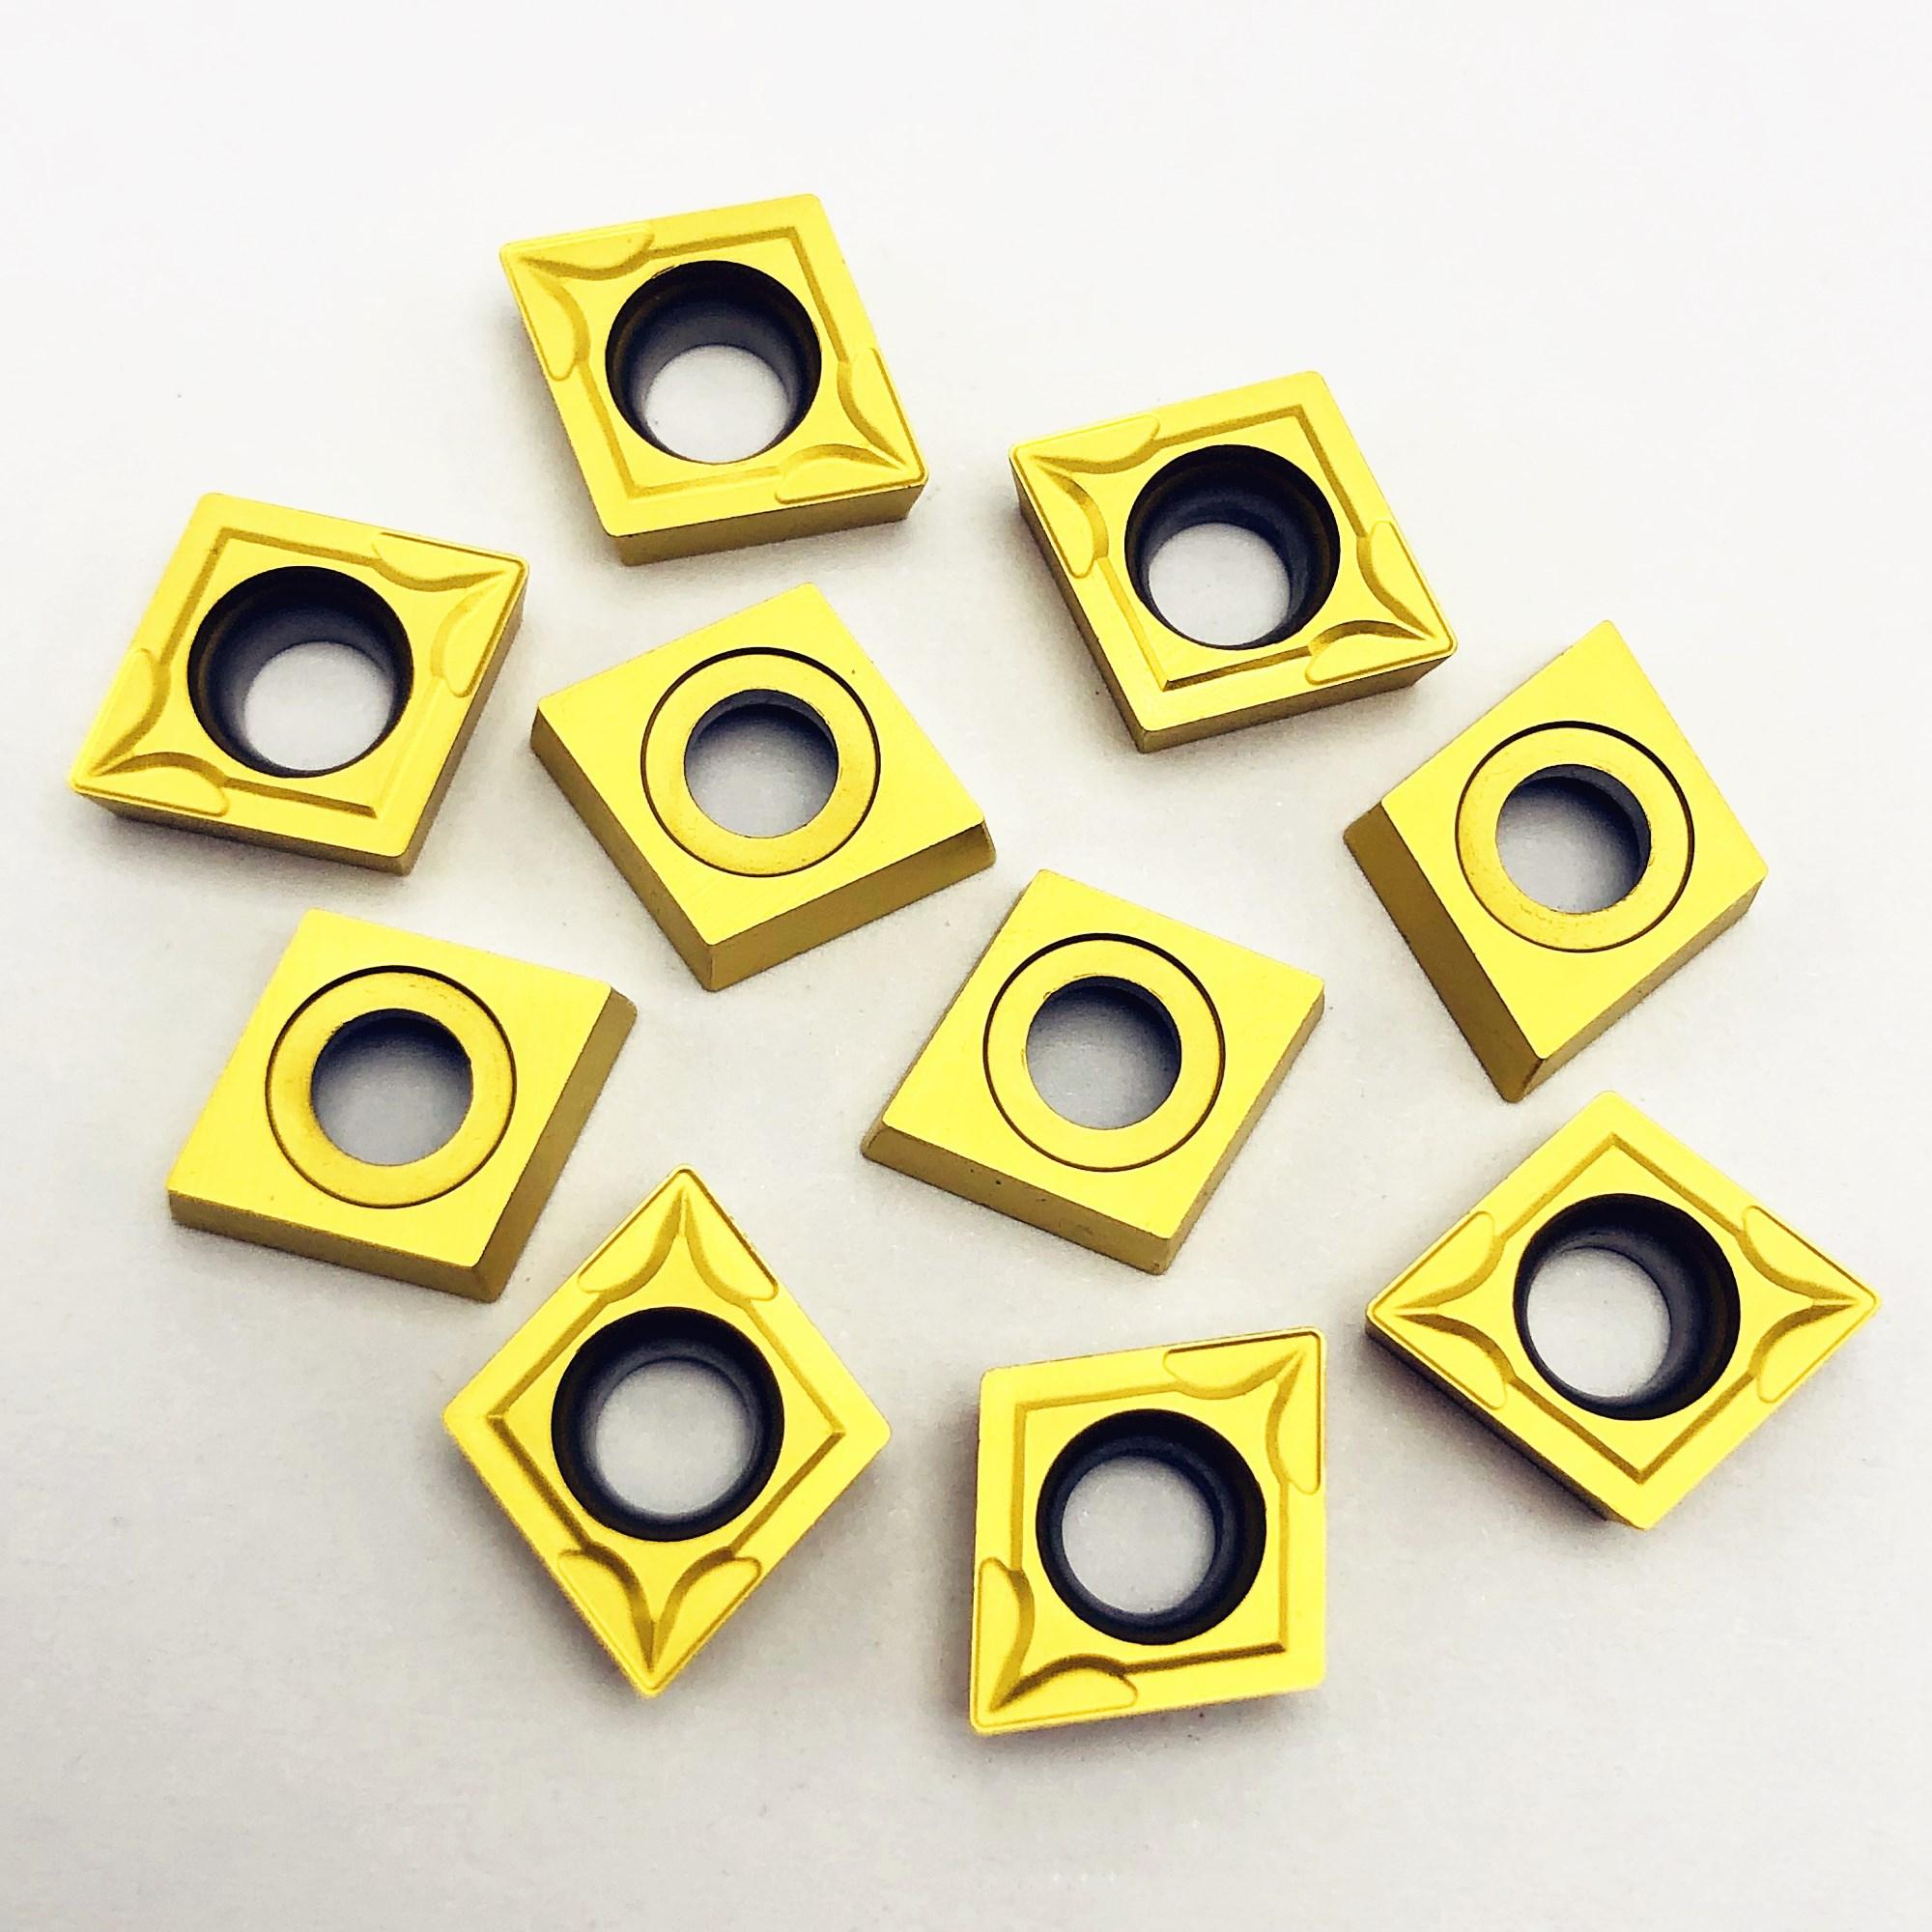 CCMT060204 US735 External Turning Tool Diamond Metal Turning Tool Inner Hole Fine Car Carbide Tools CCMT 060204 Cutting Tool